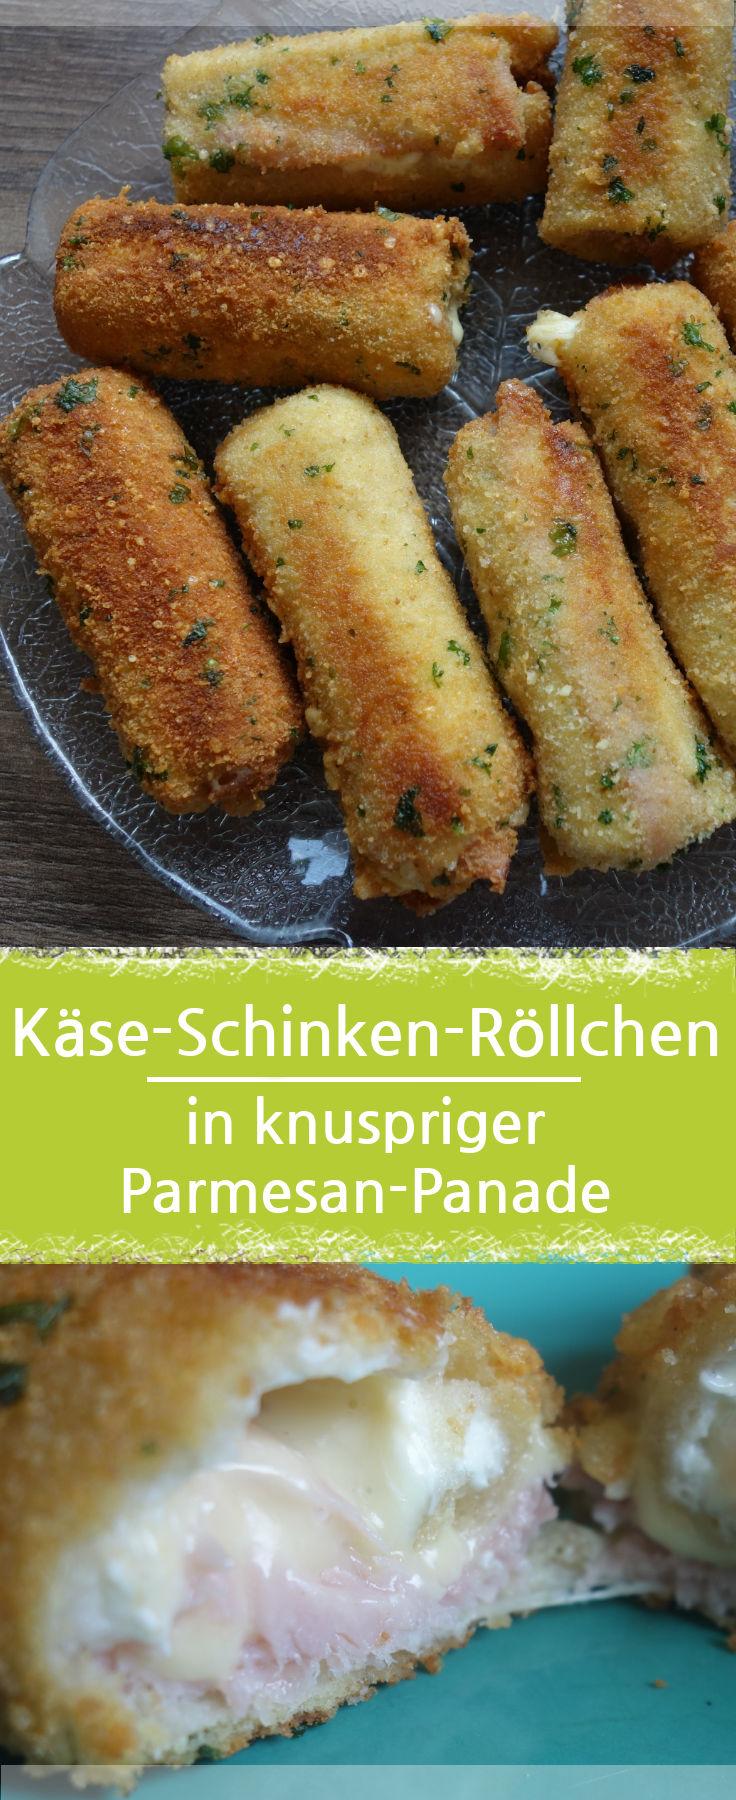 kaese-schinken-rolle-gl